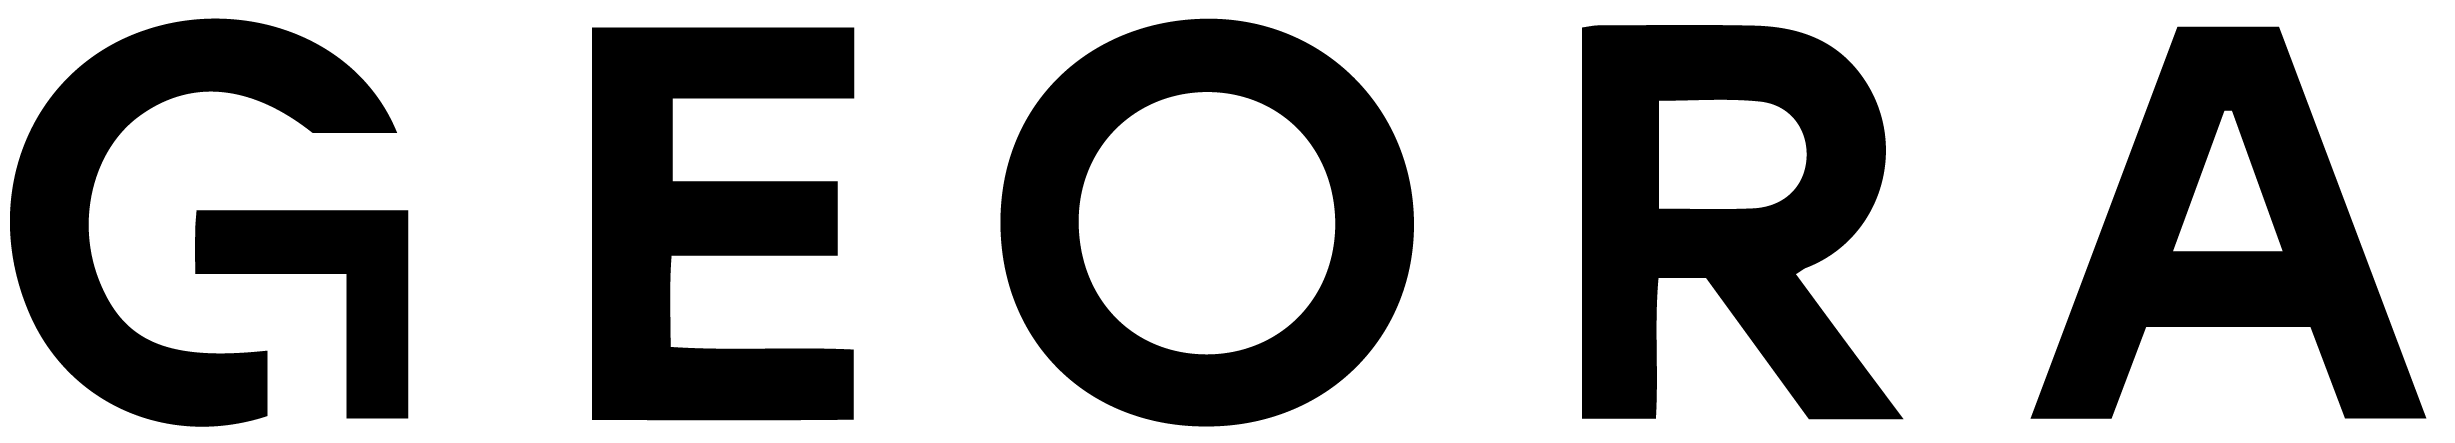 Geora